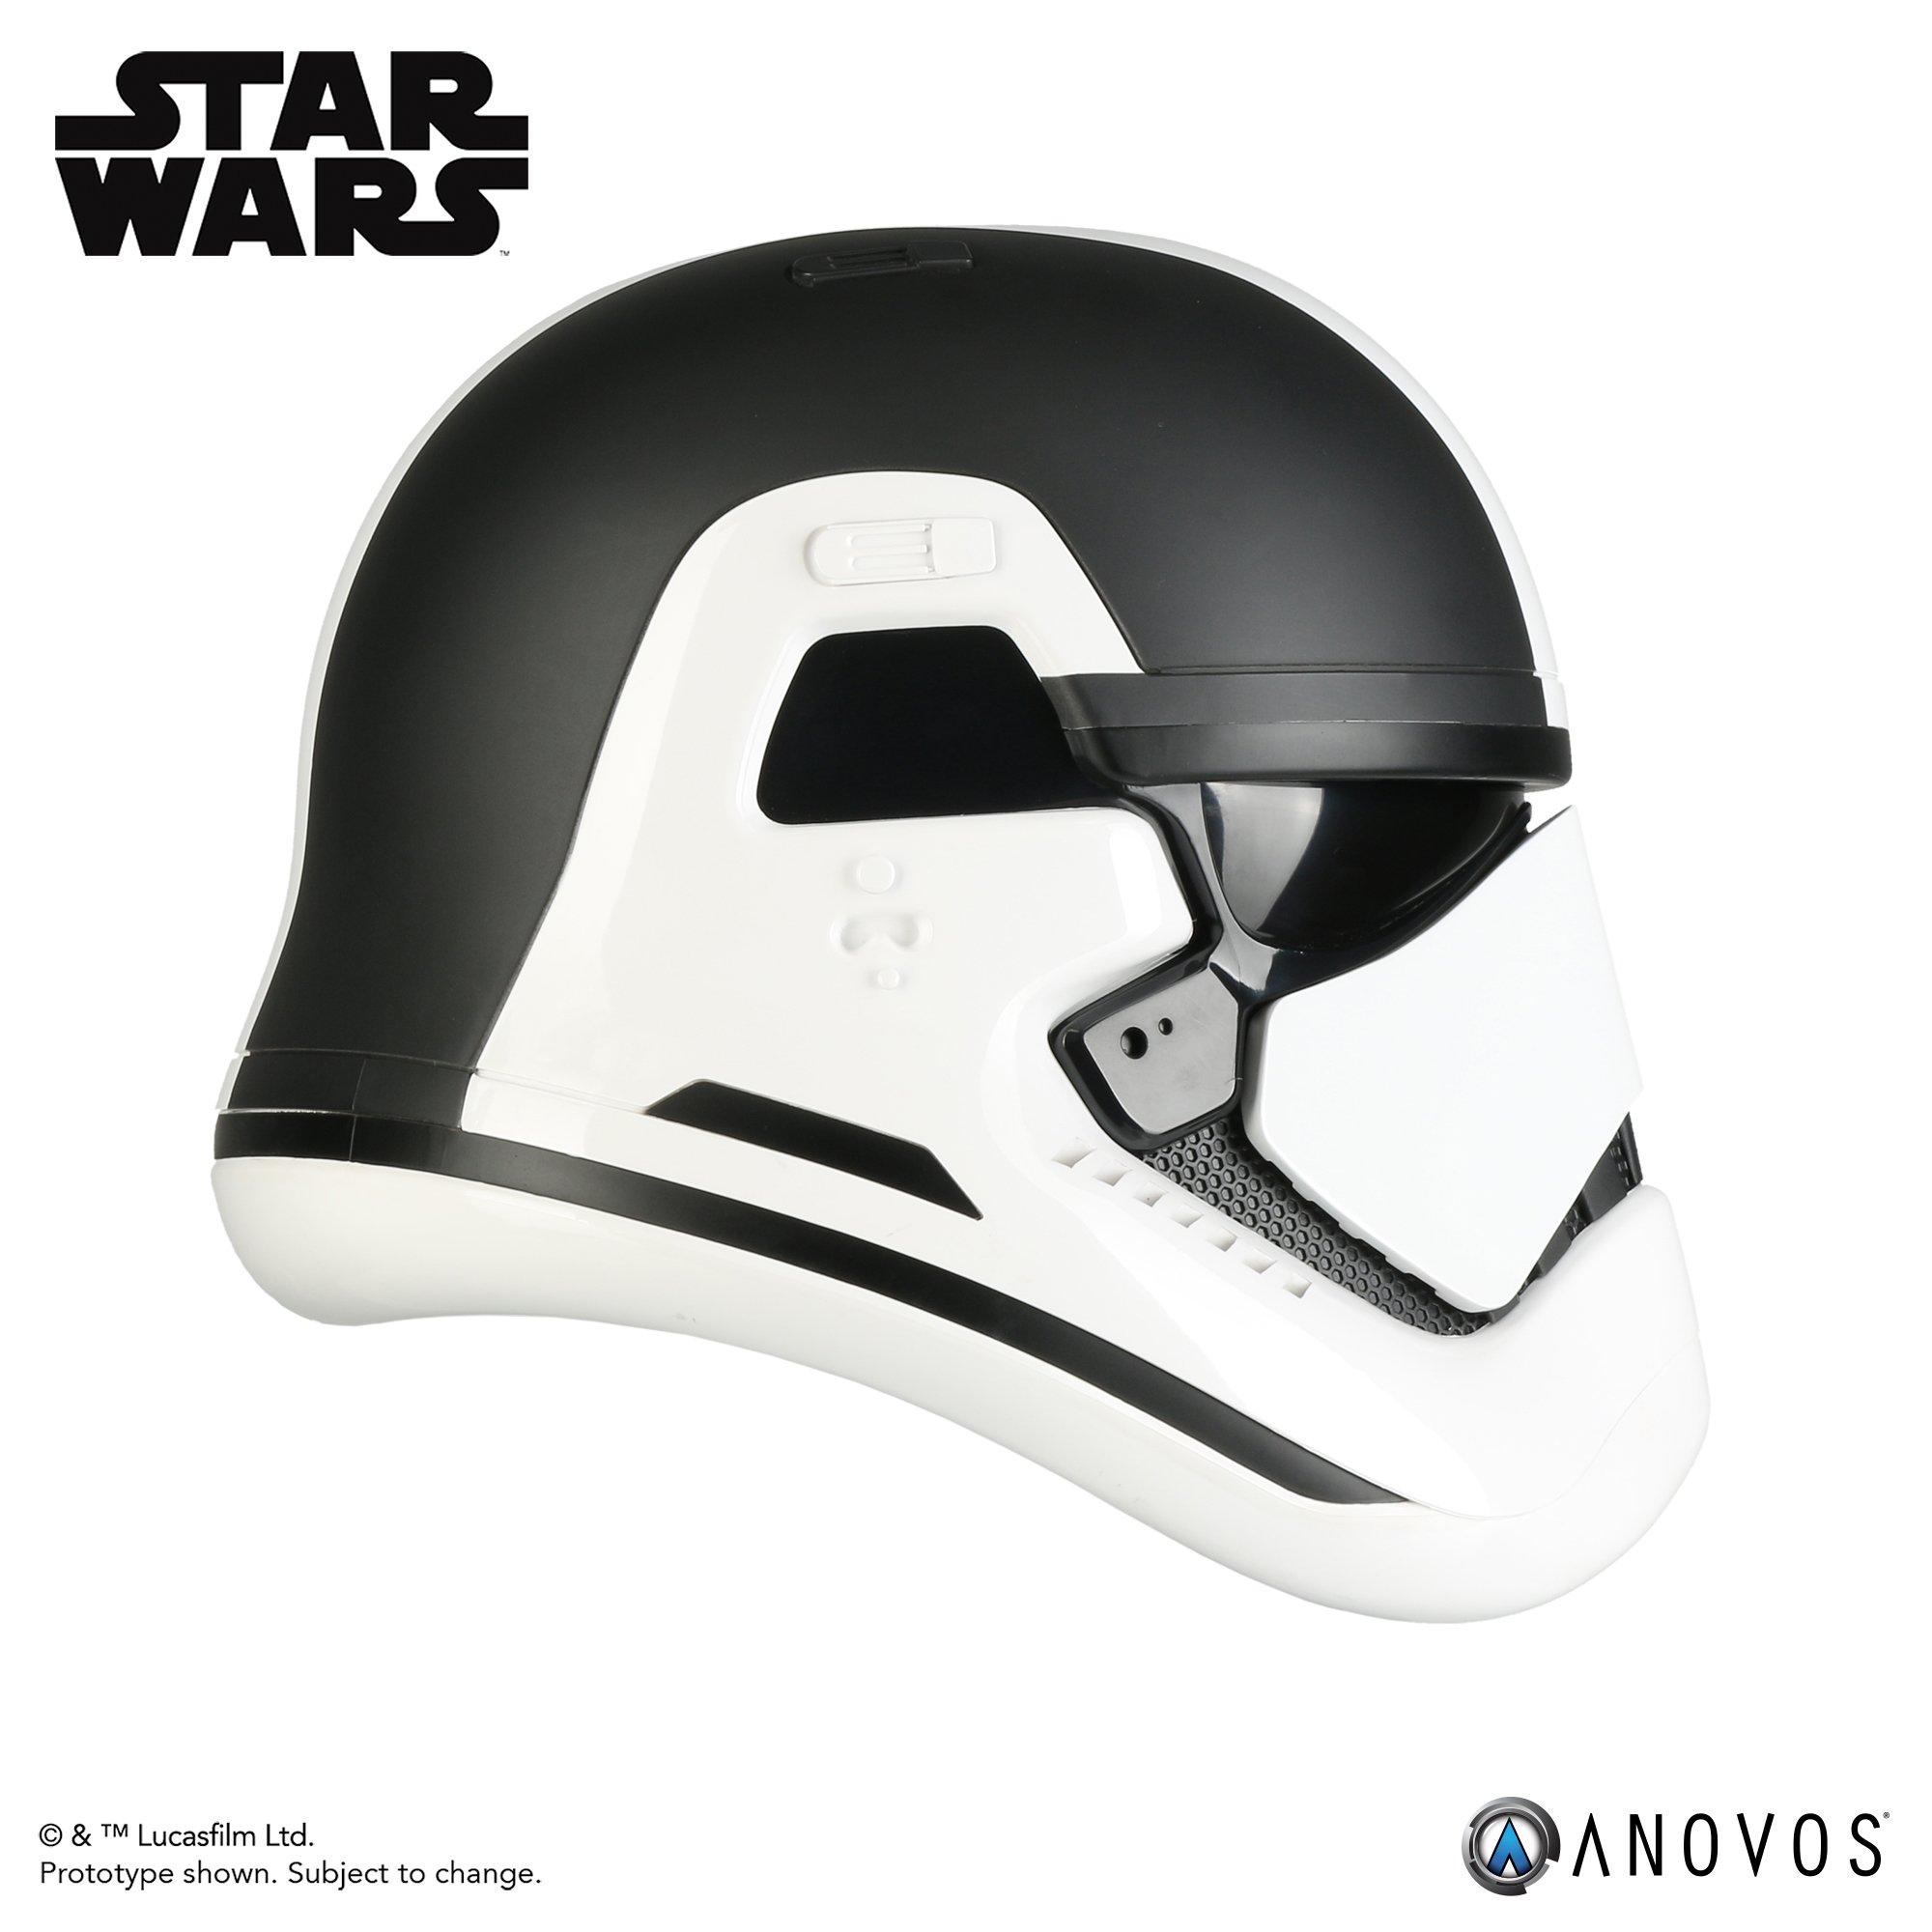 szmk_star_wars_csillagok_haboruja_last_jedi_utolso_jedik_helmet_sisak_5.jpg